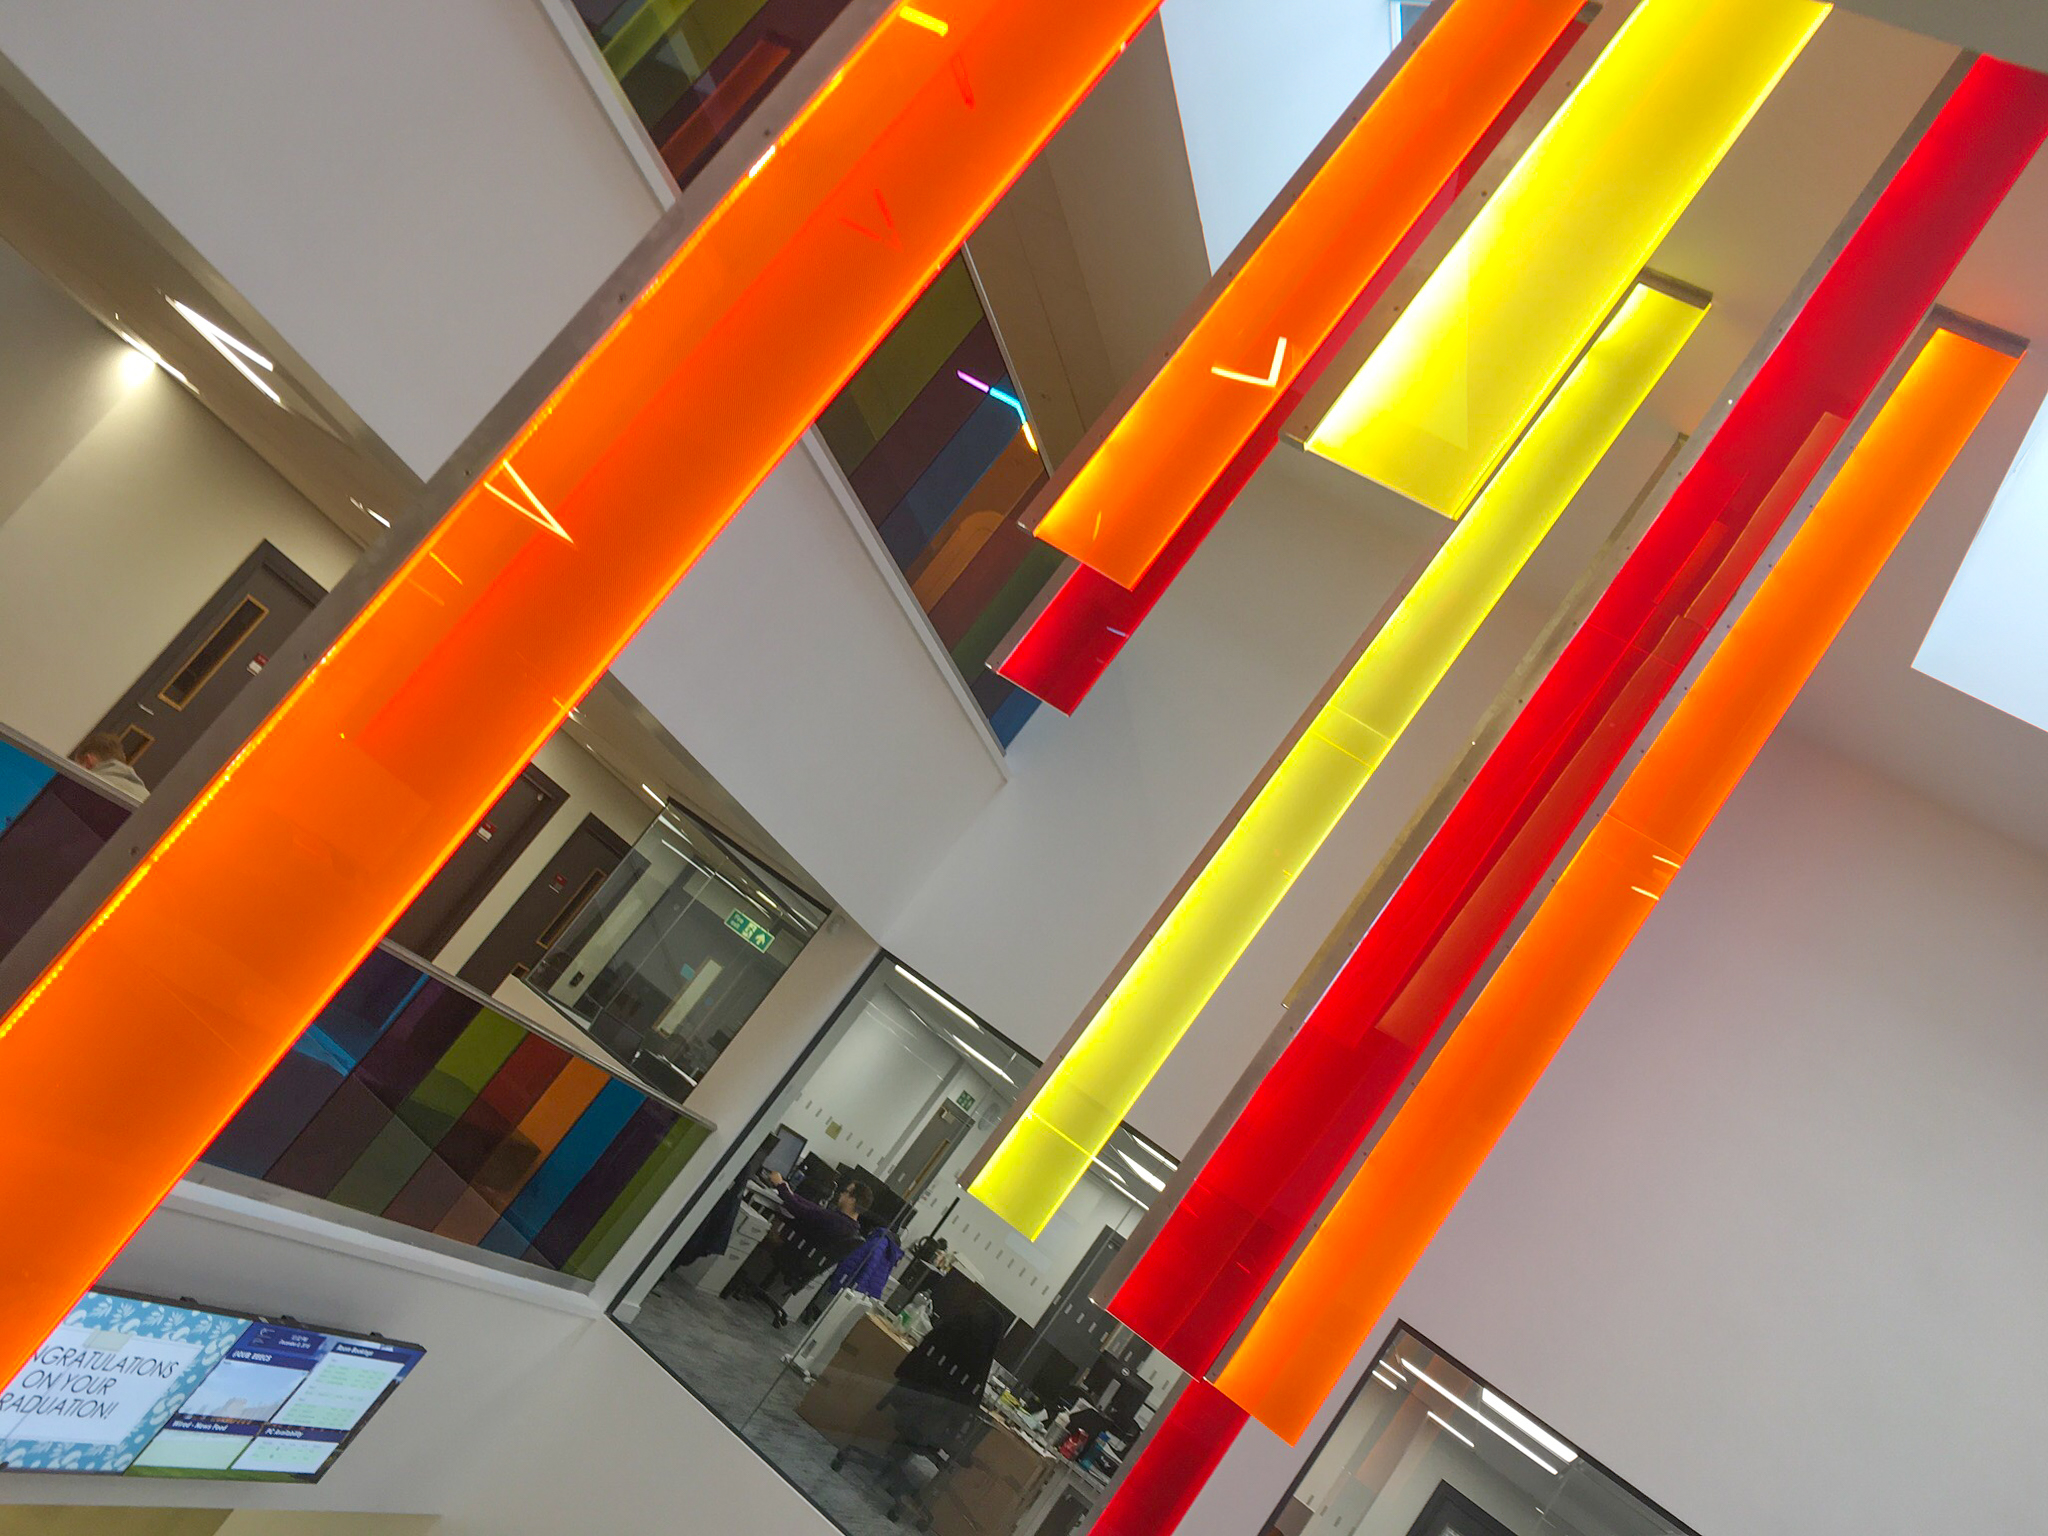 Bernard Crossland Building:  Bespoke internally illuminated fins